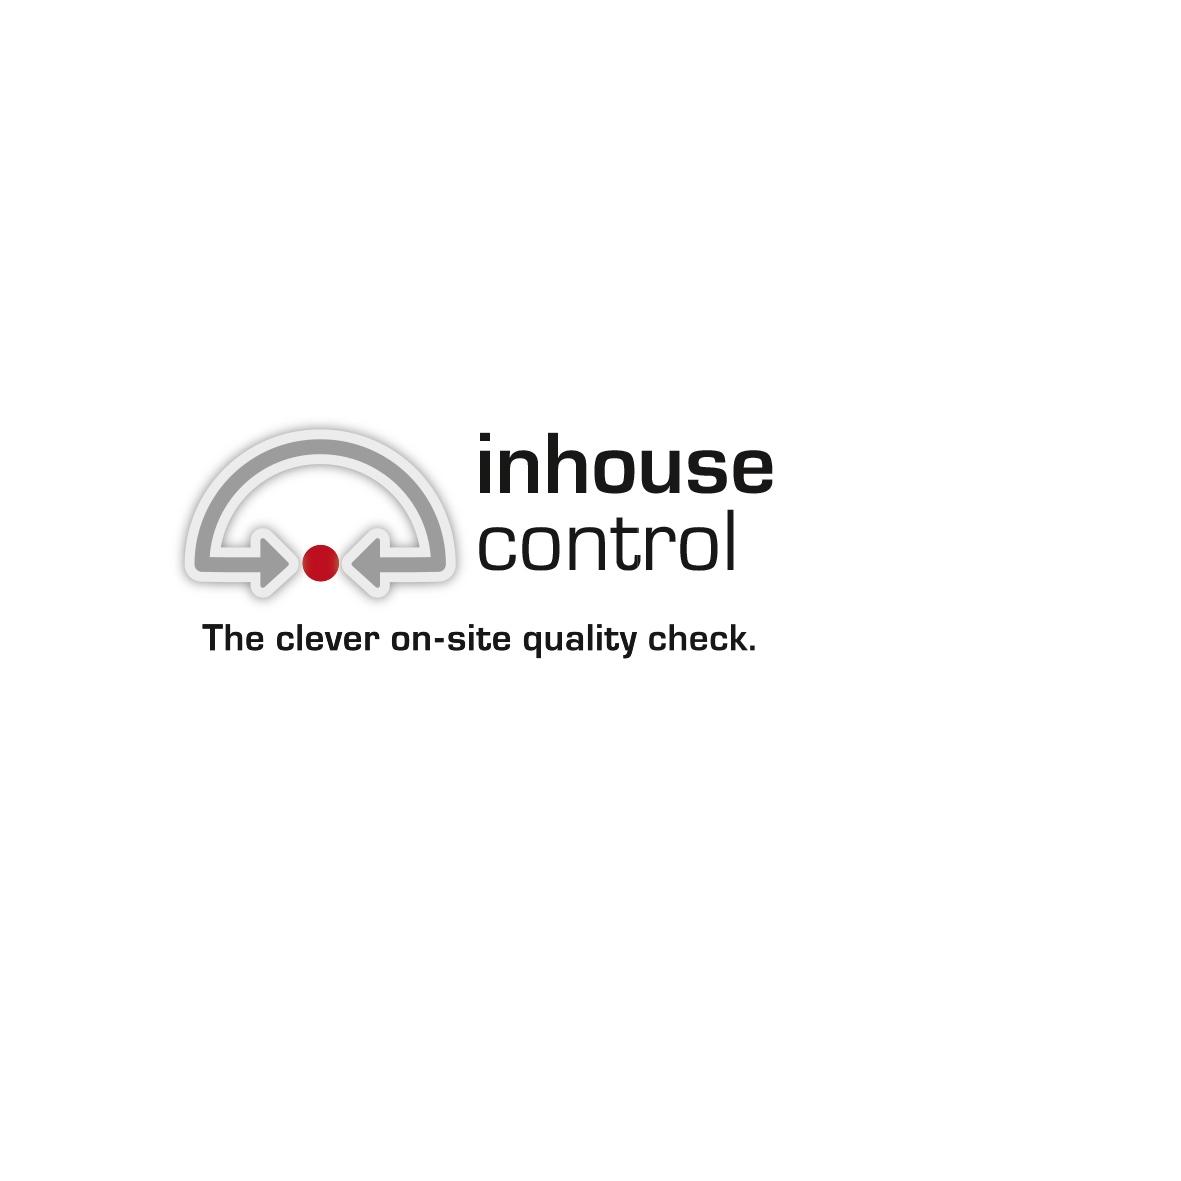 Logo Inhouse Control